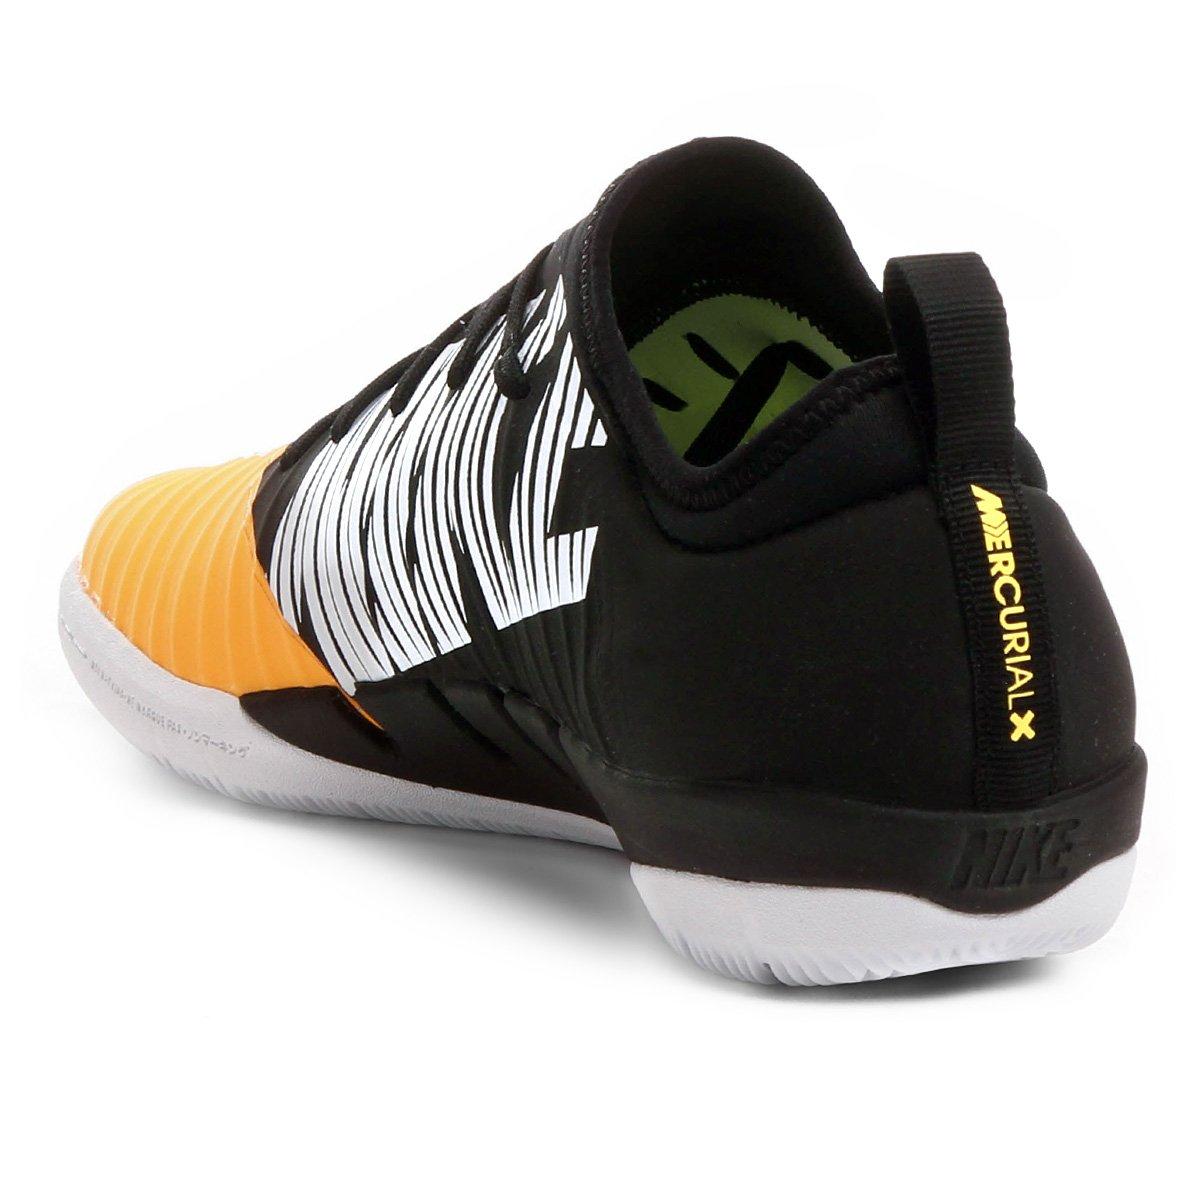 Chuteira Futsal Nike Mercurial Finale 2 IC - Compre Agora  744ee6ba9231c